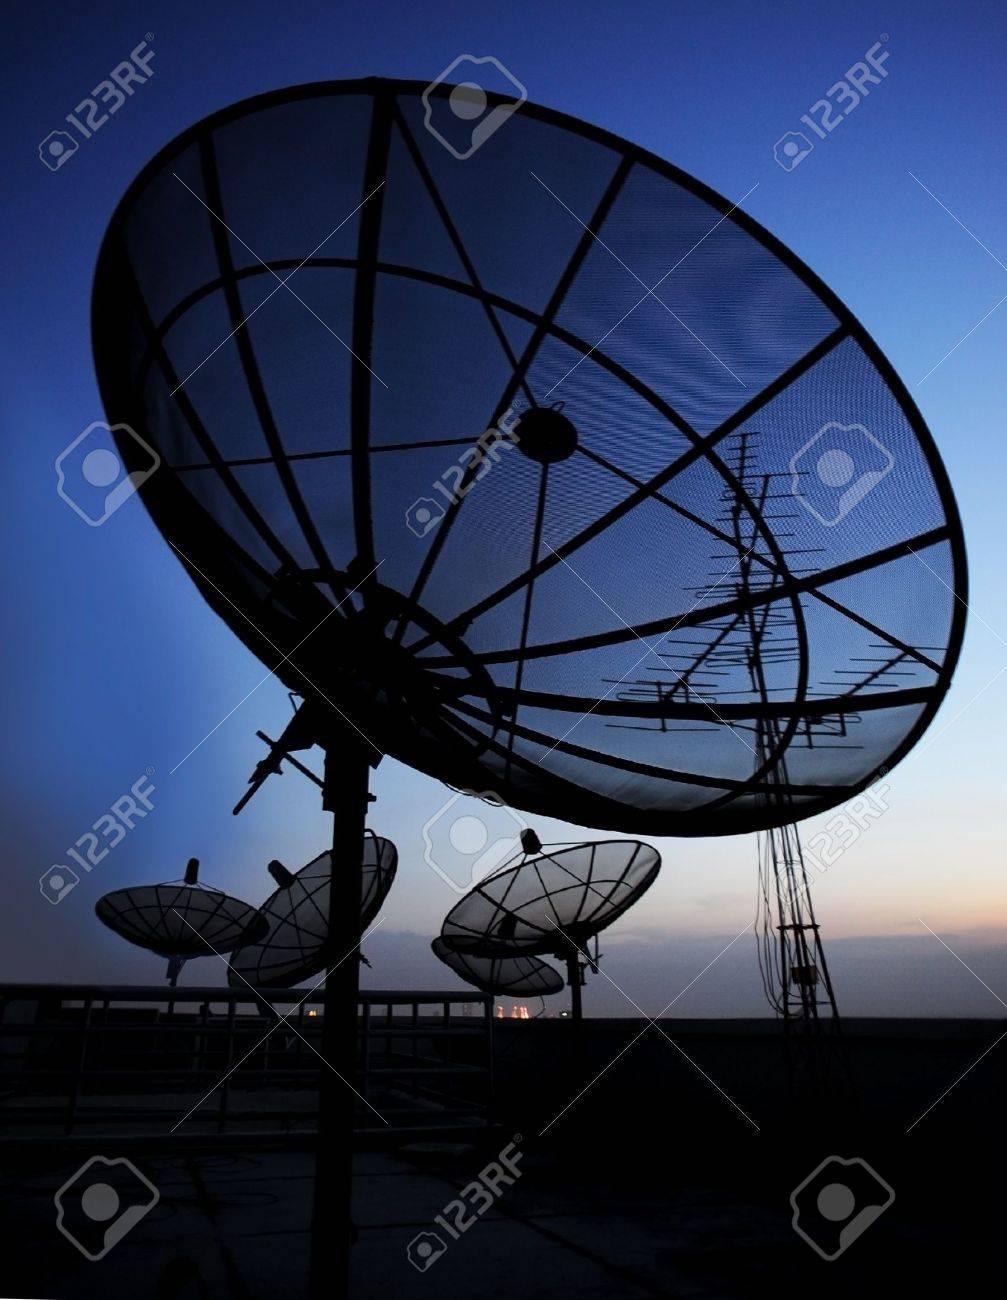 satellite communication disk on evening background Stock Photo - 8875909